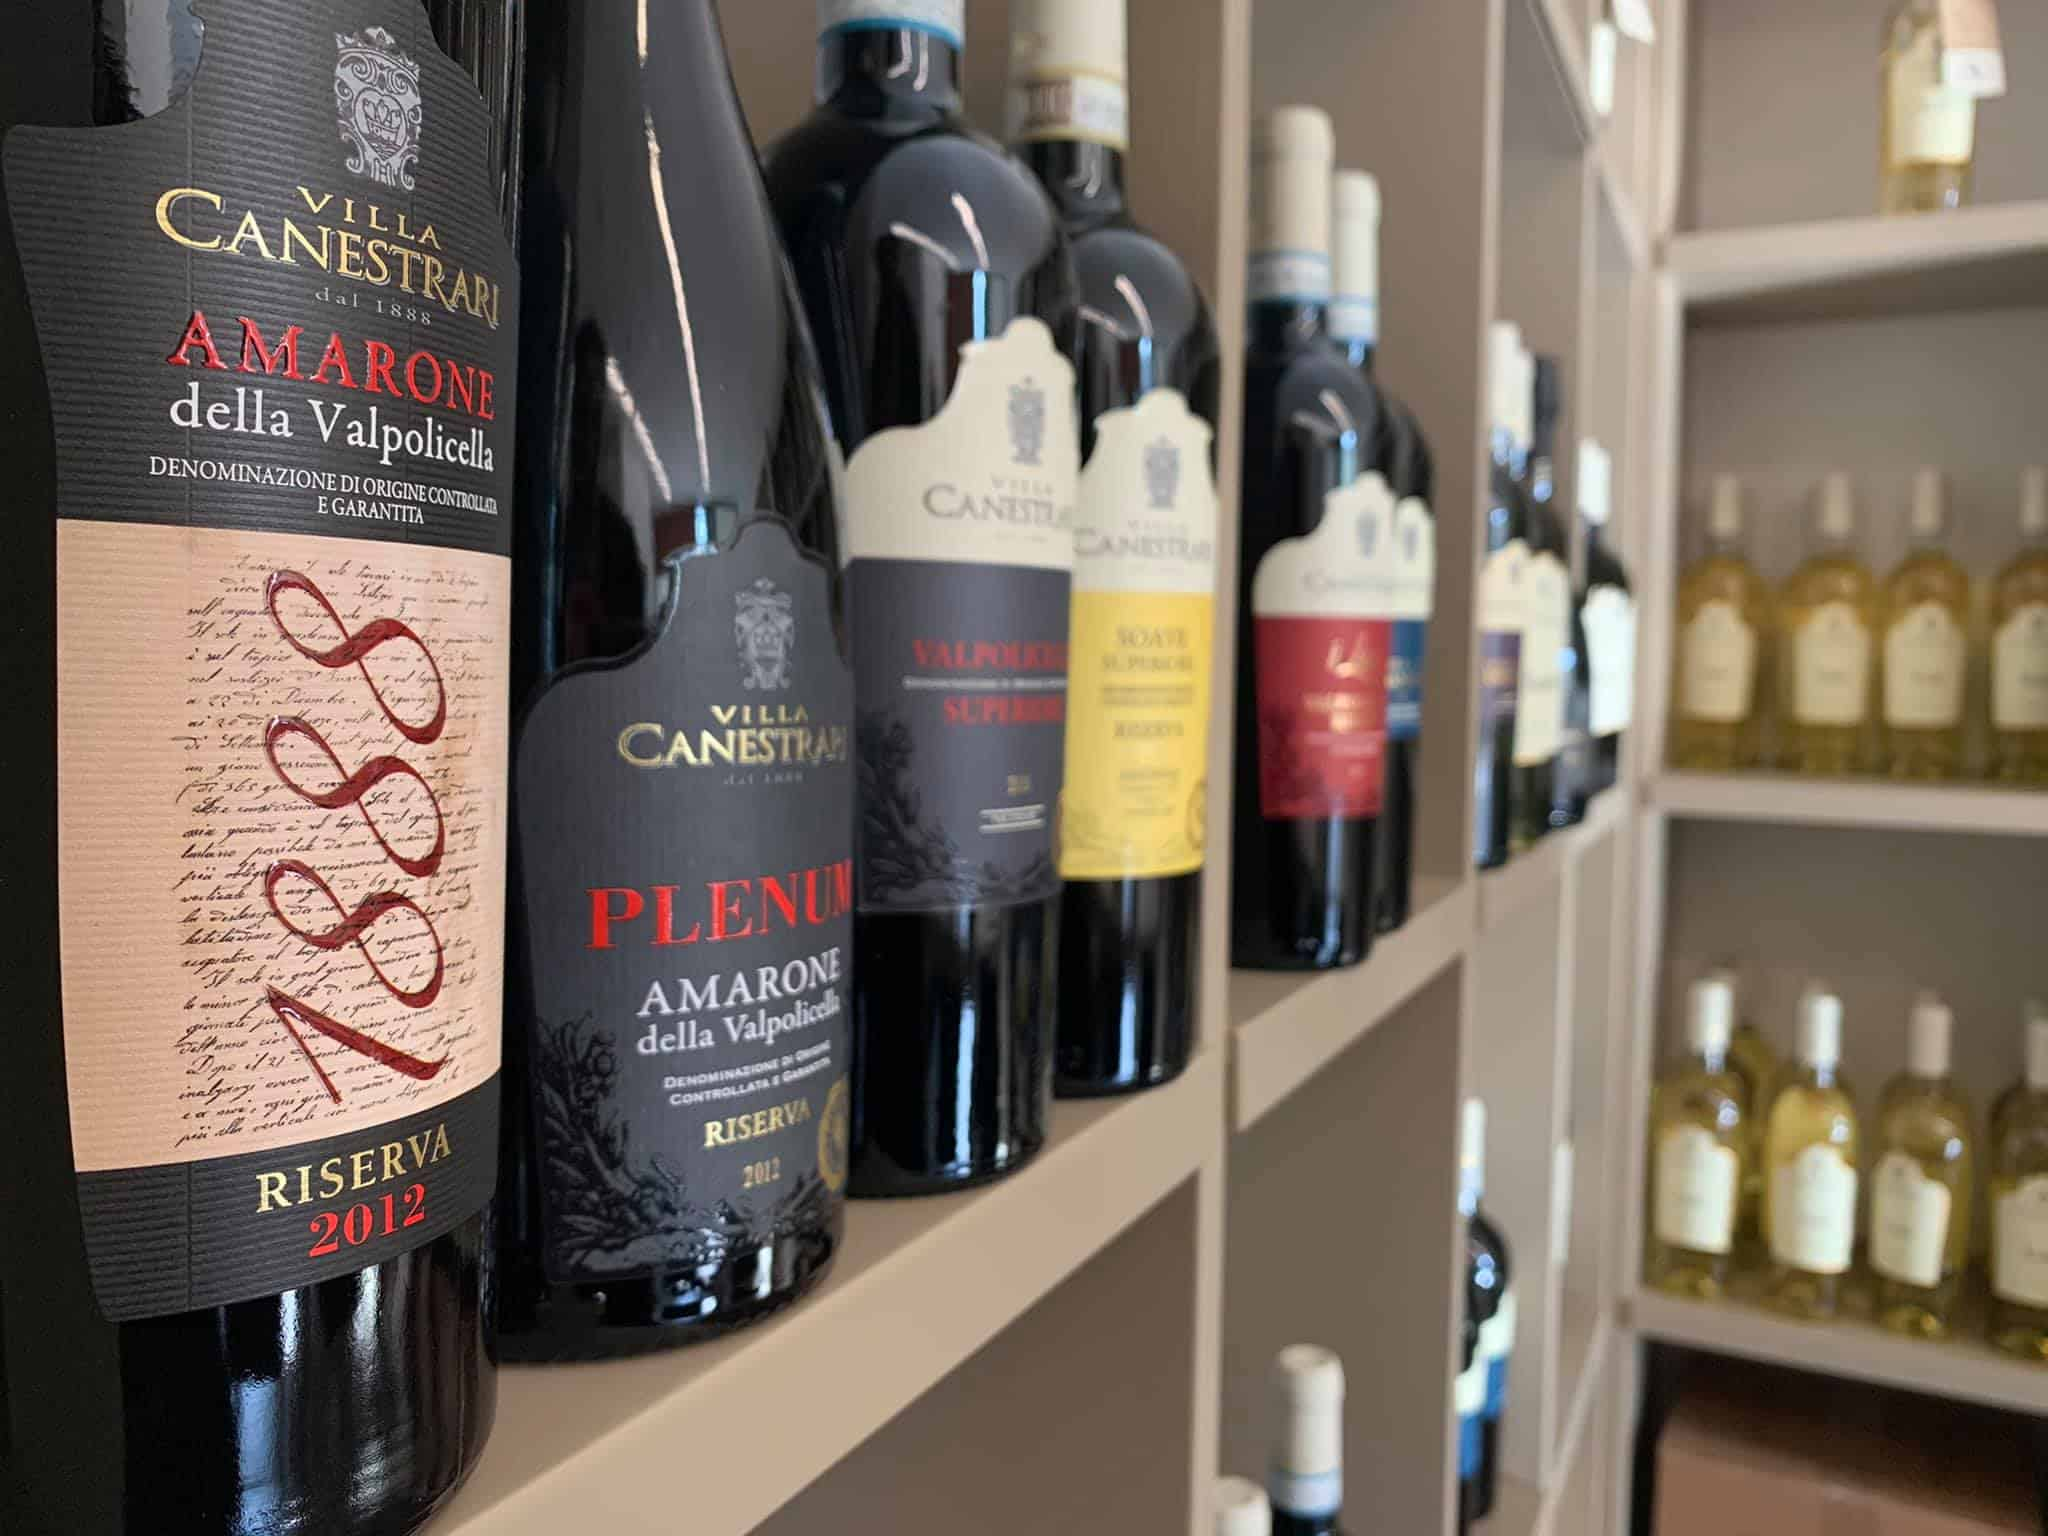 Villa Canestrari wines